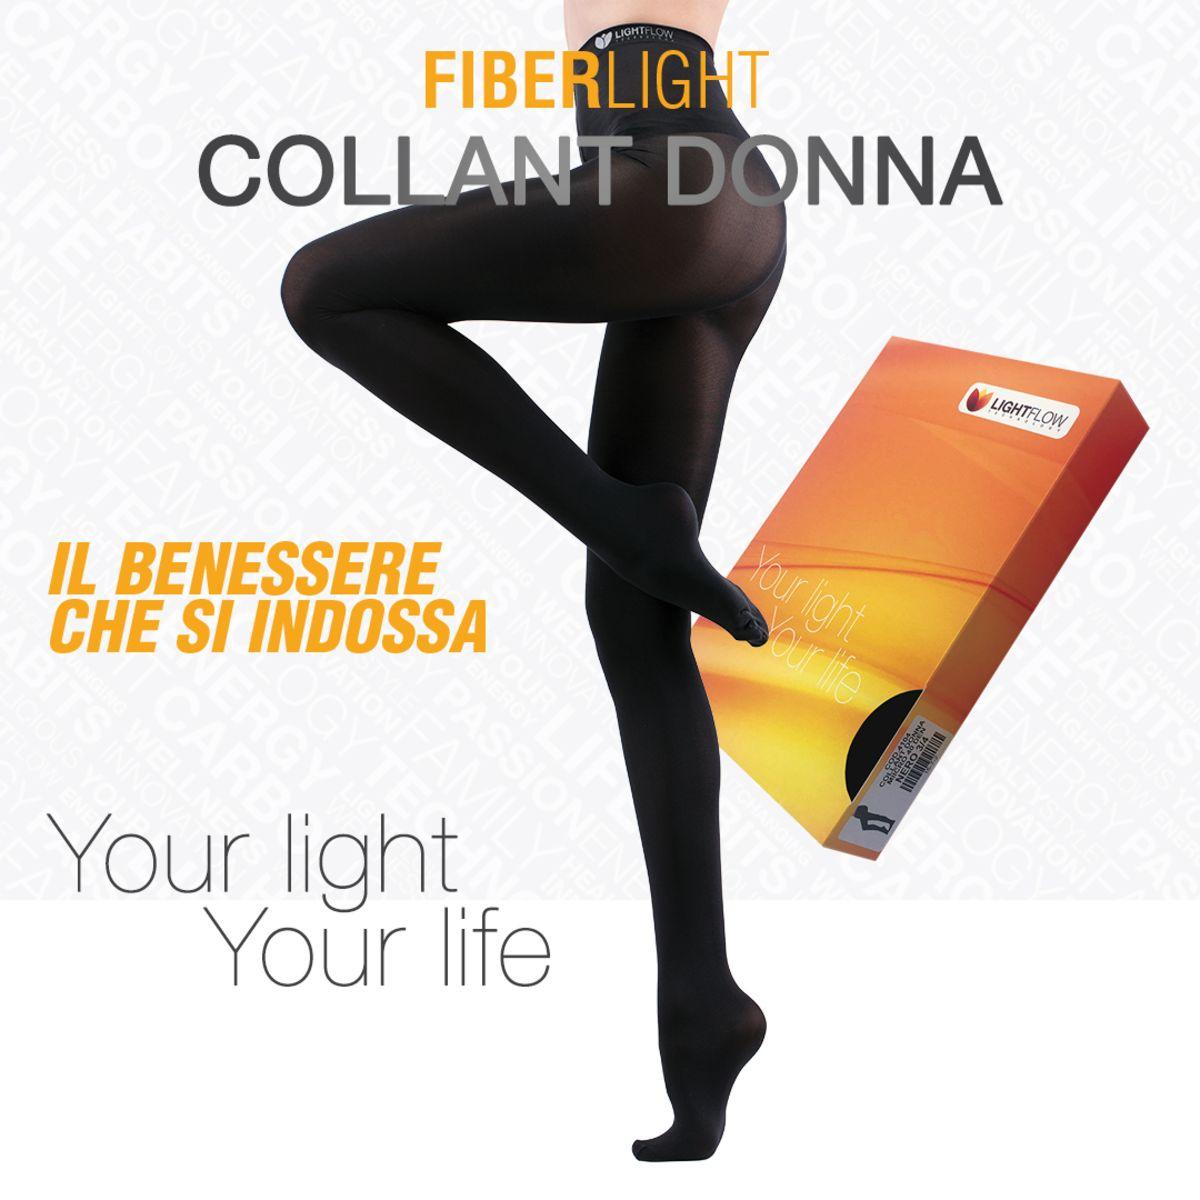 Lightflow prodotti Fiberlight